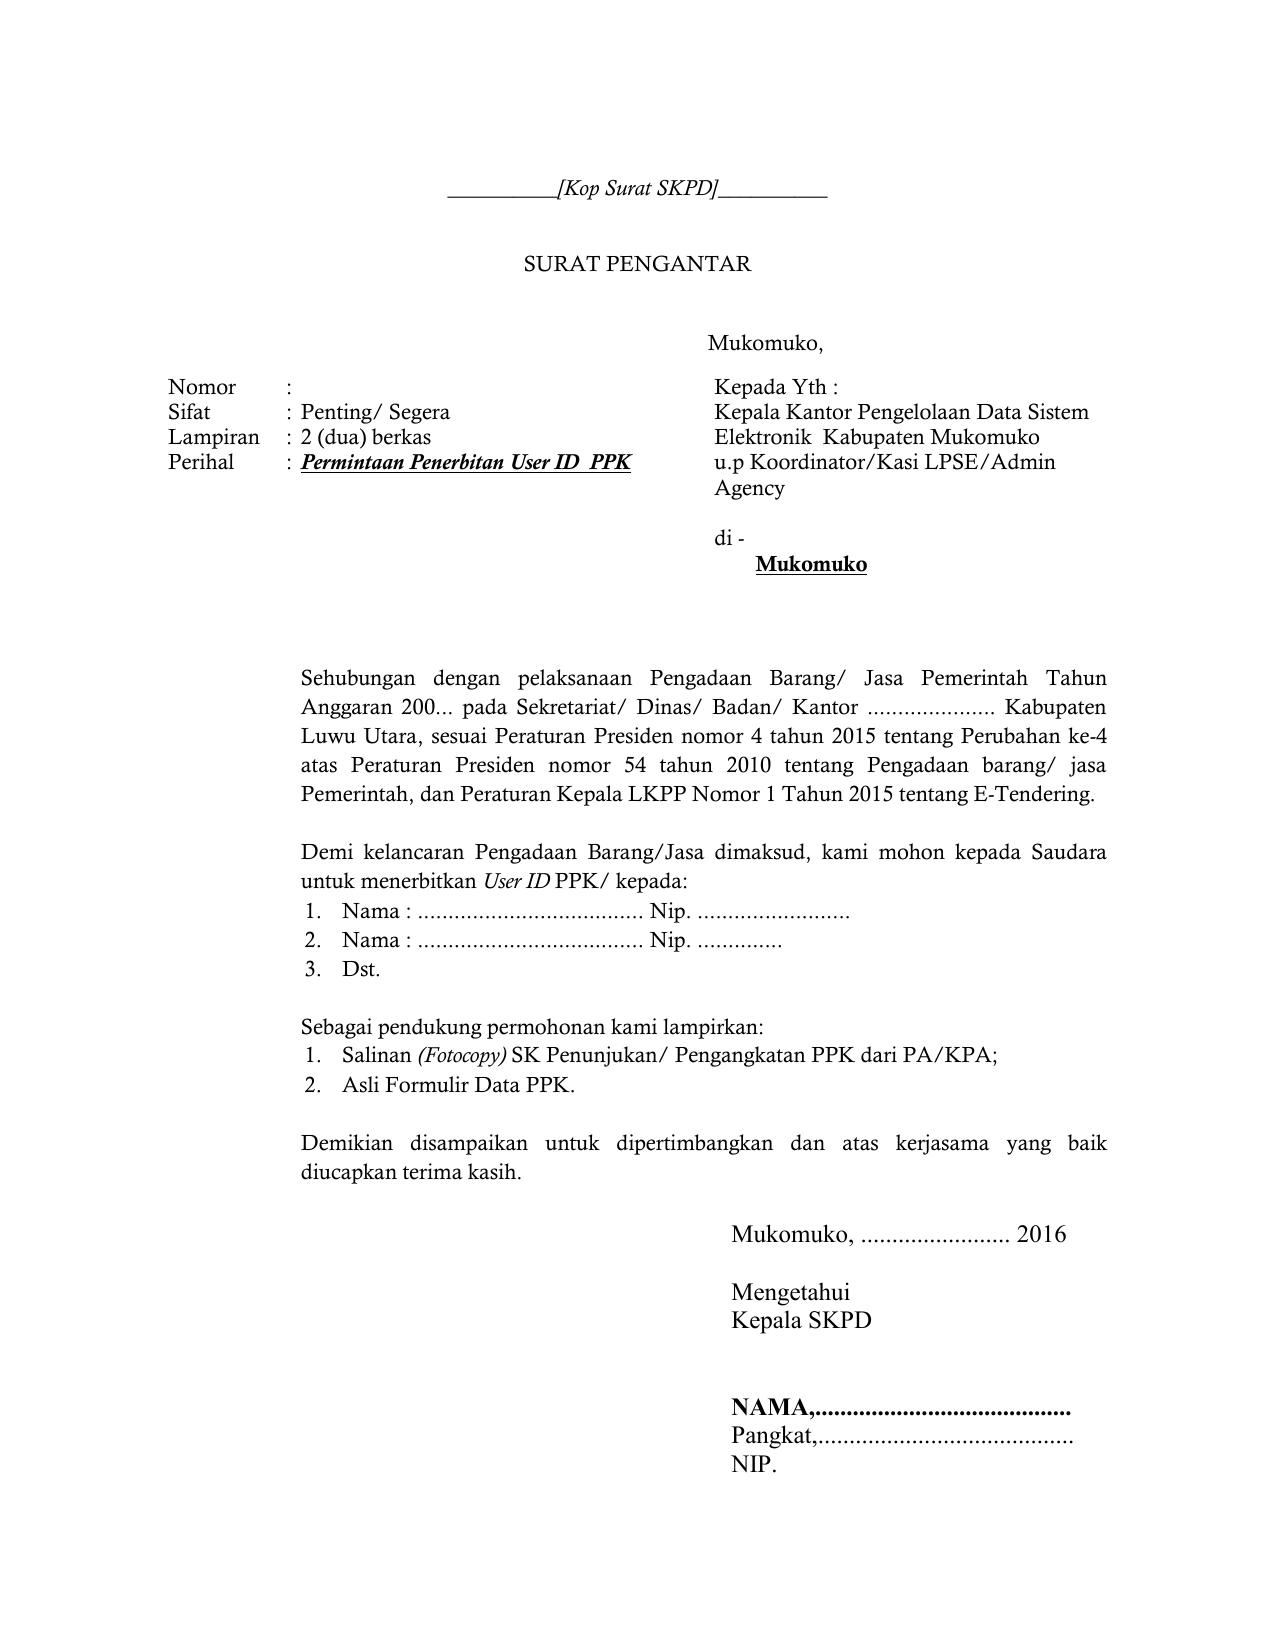 Format Surat Permintaan Penerbitan User Id Ppk